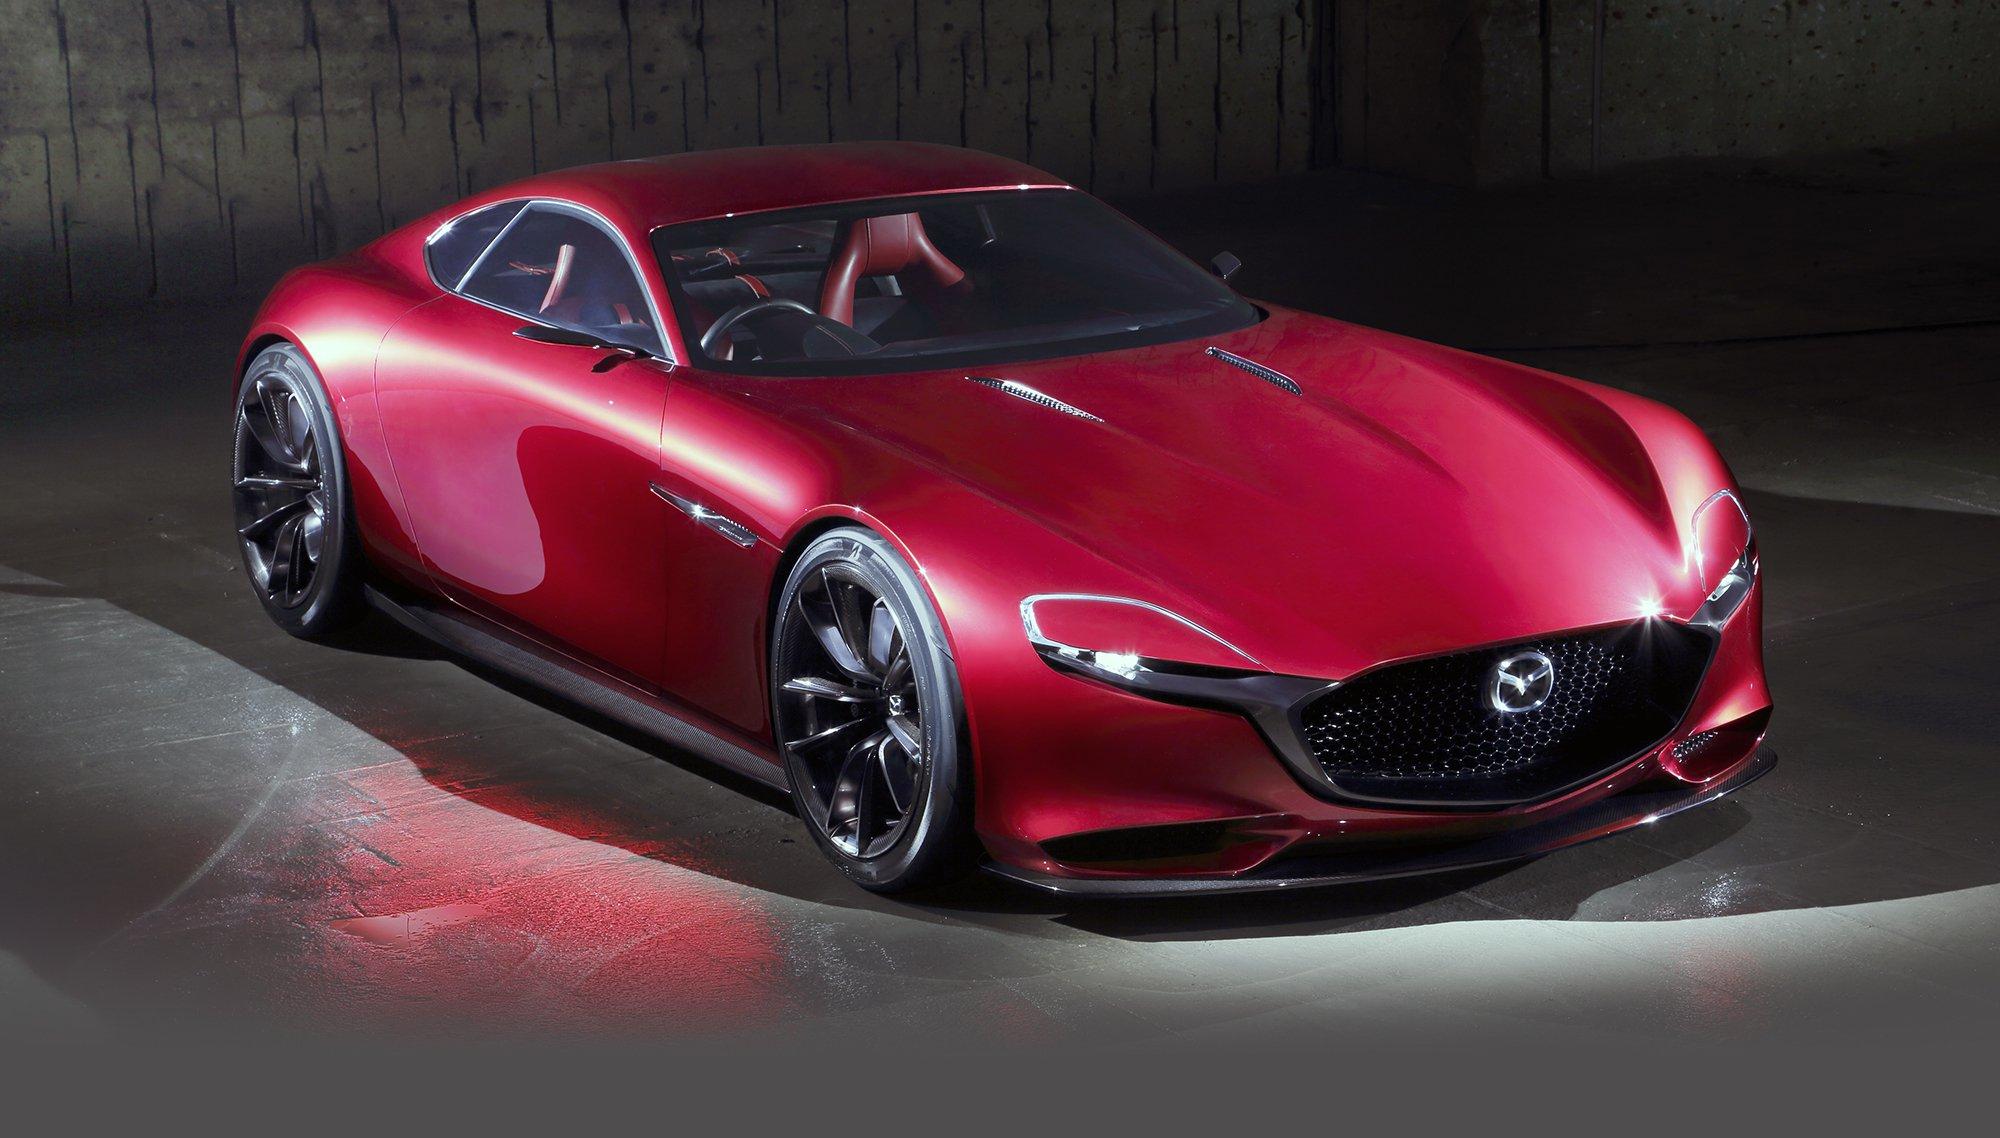 2020 Mazda RX7 Wallpaper